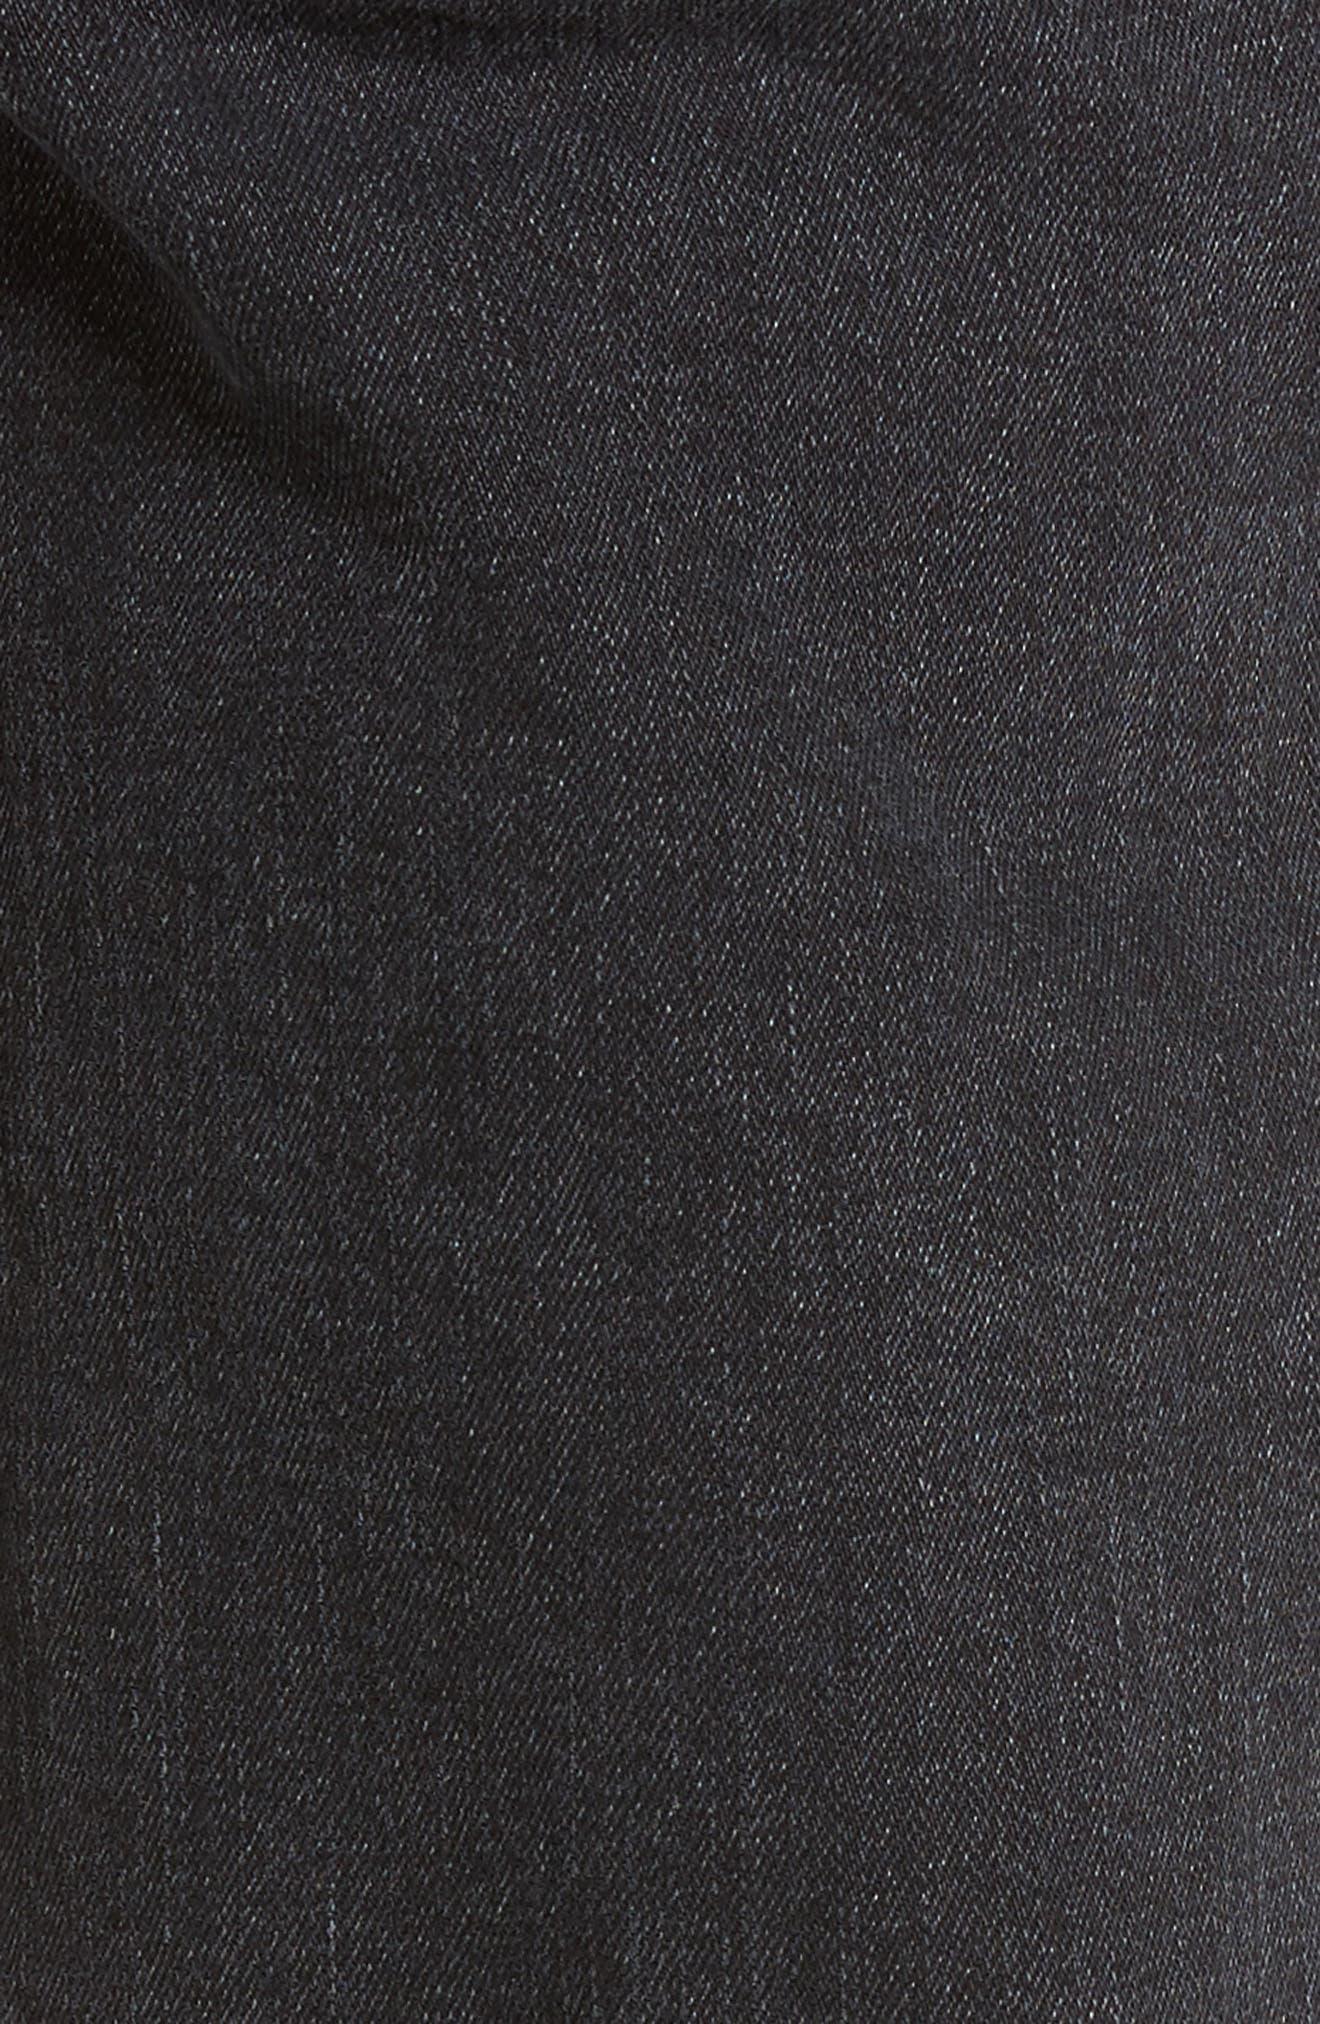 Brixton Slim Straight Fit Jeans,                             Alternate thumbnail 5, color,                             438